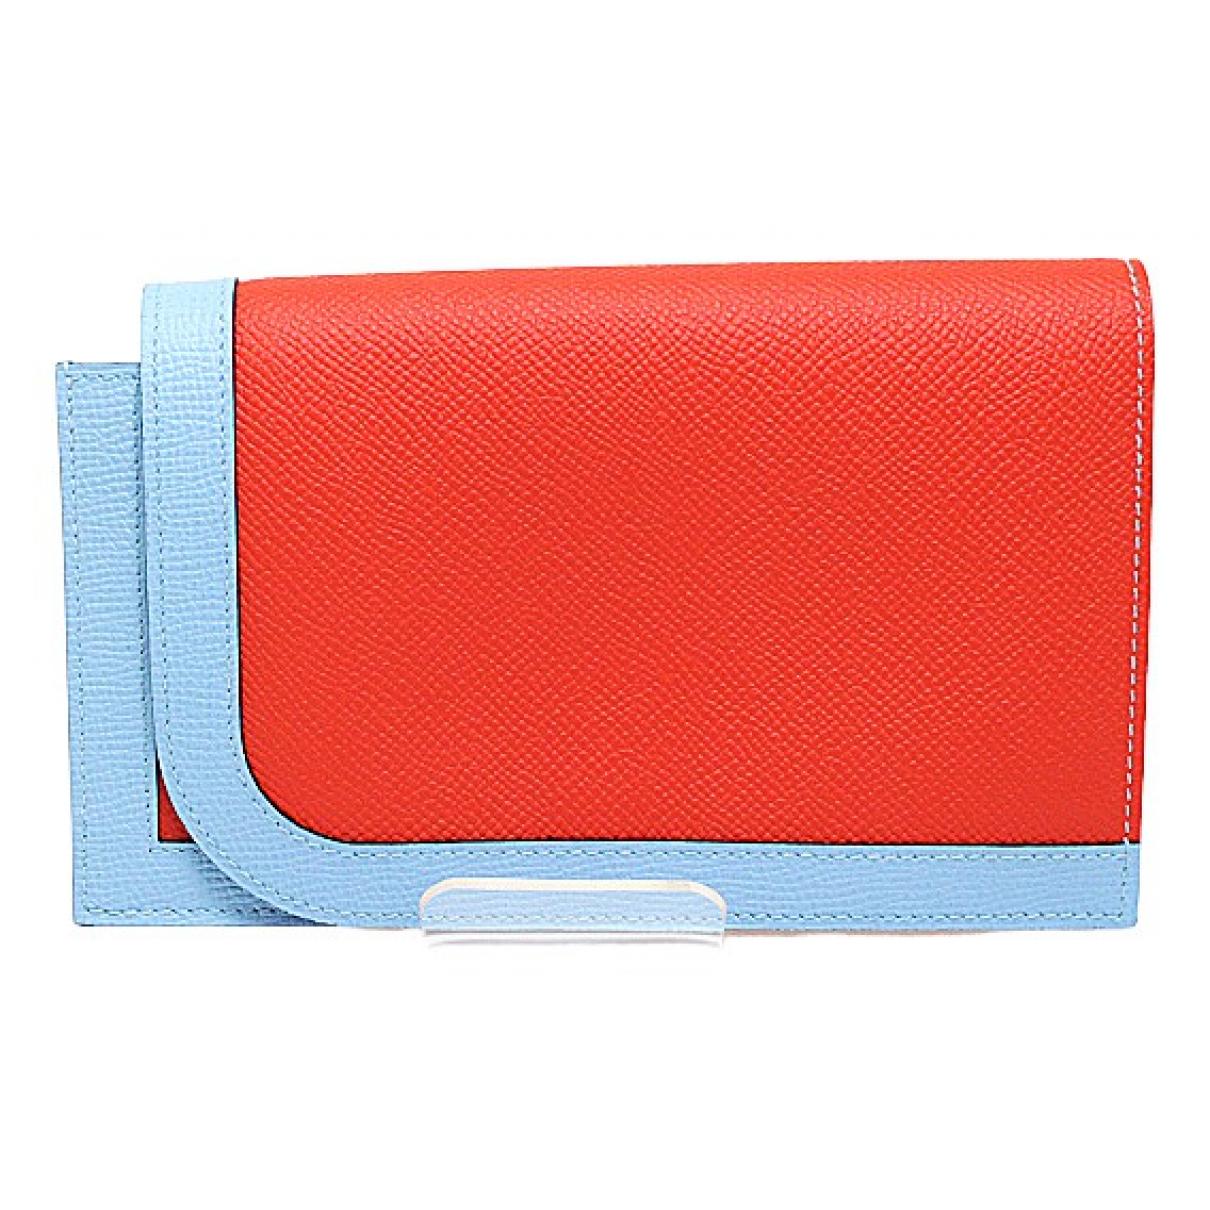 Hermès Camail Multicolour Leather wallet for Women N